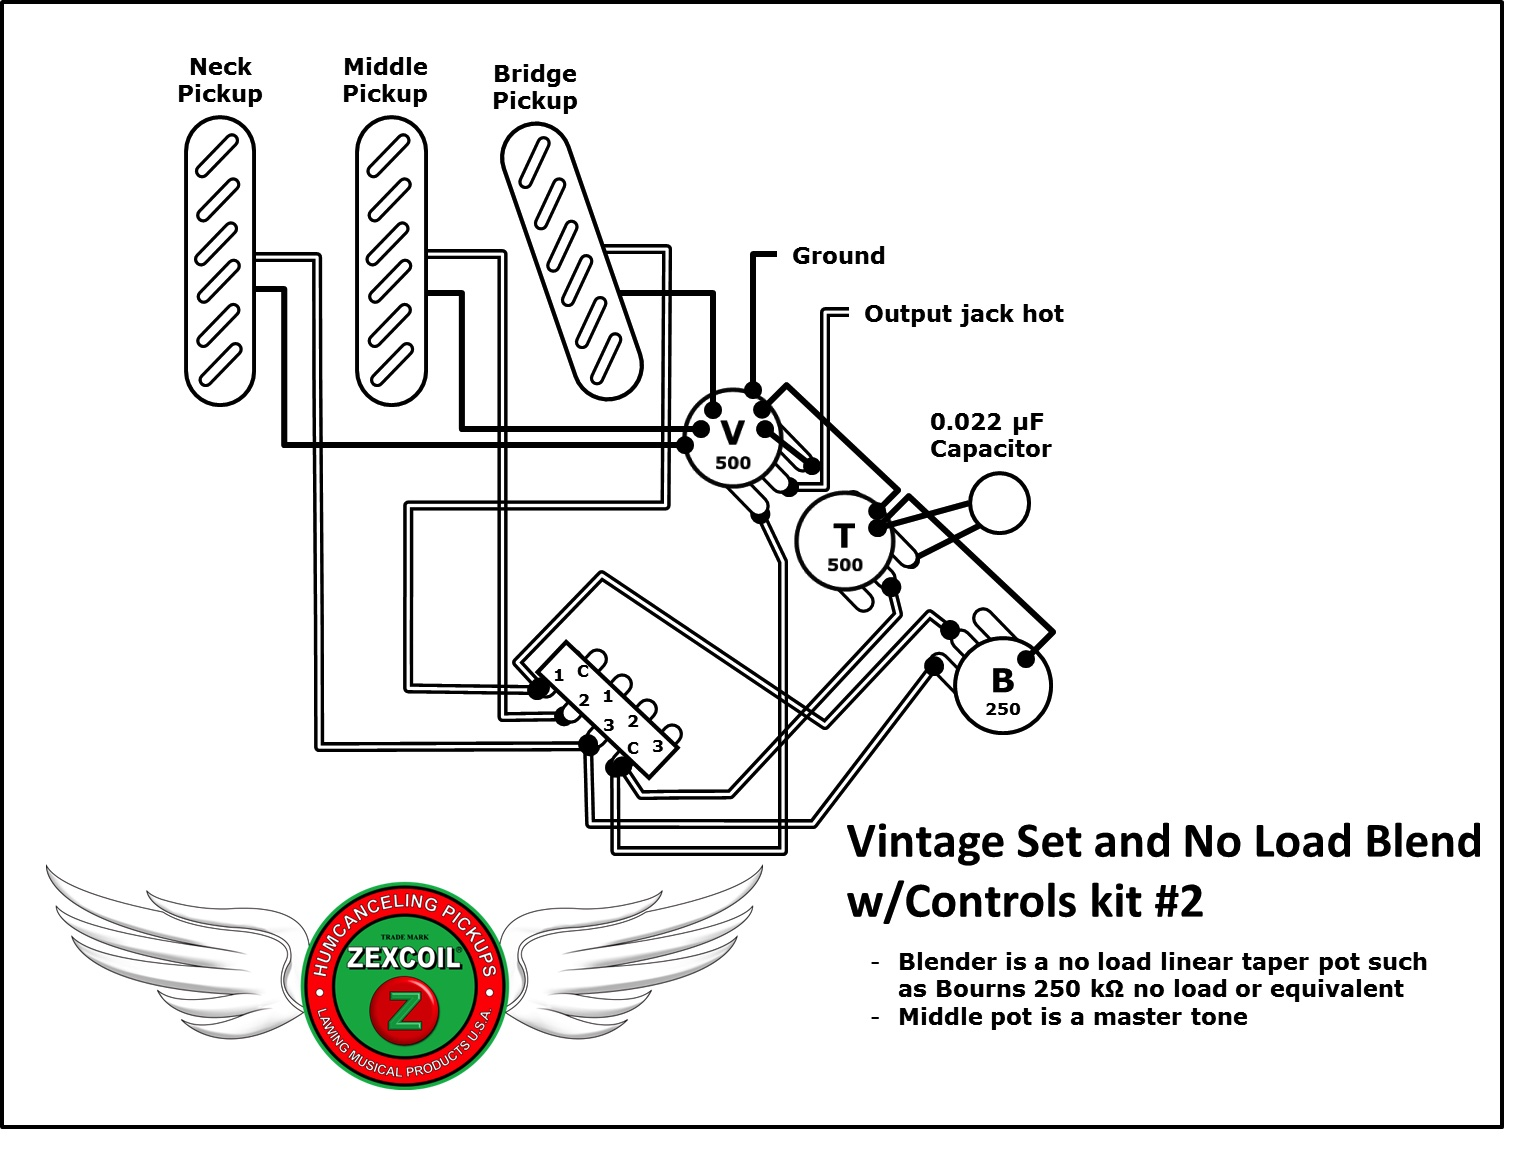 Controls Kit #2